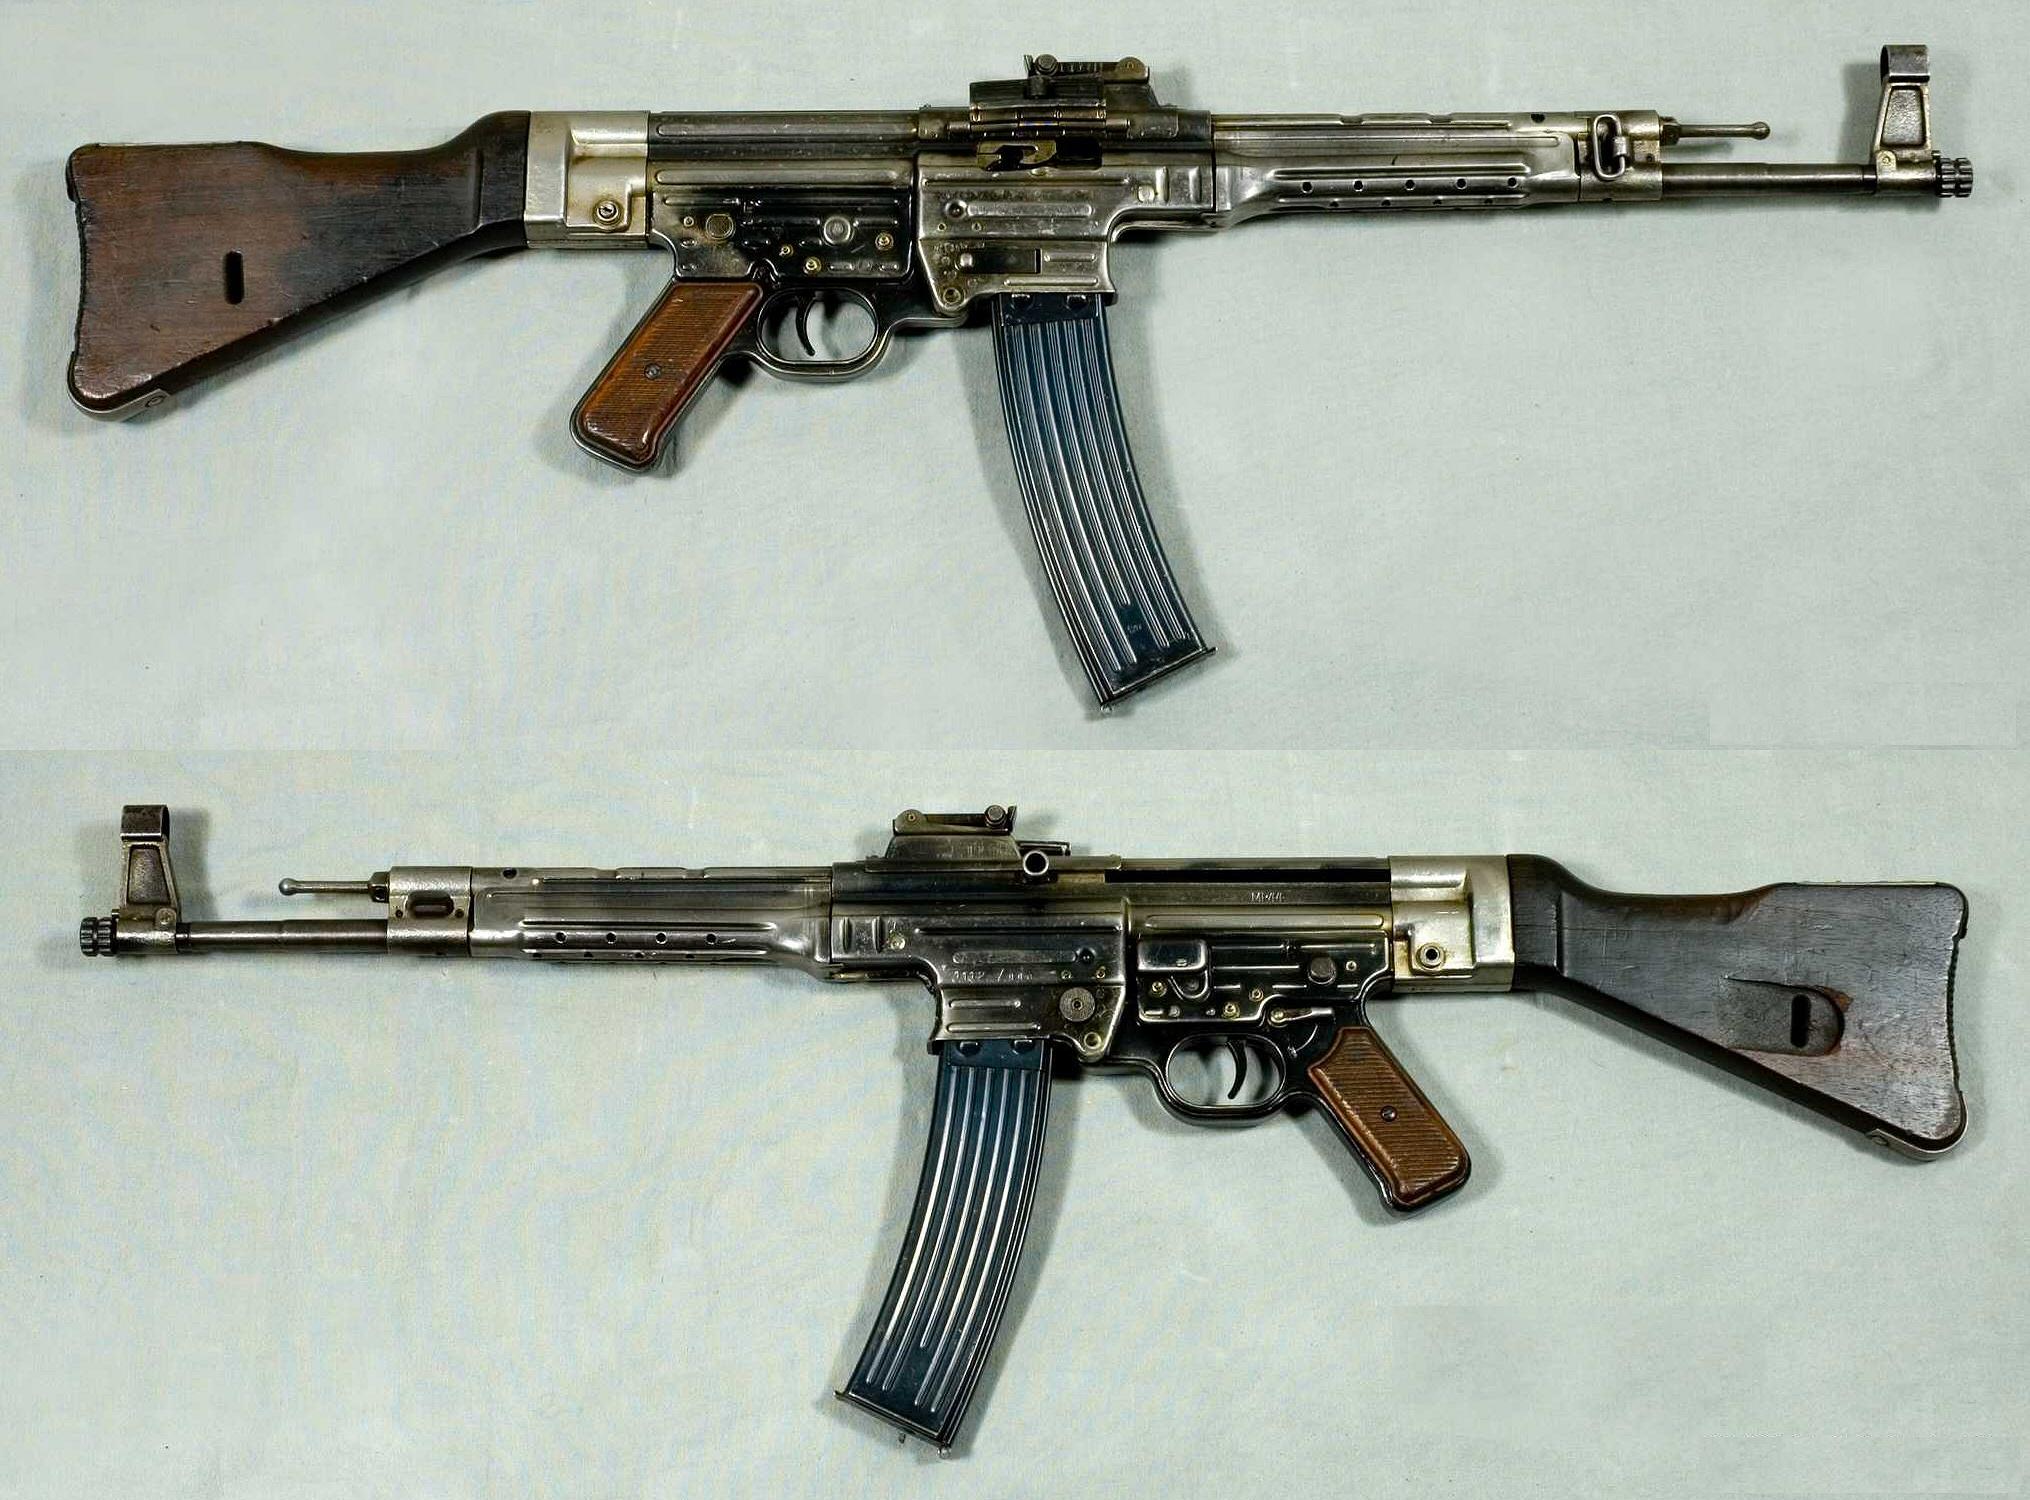 guerra - Curiosidades de la guerra fría: la URSS MP44_-_Tyskland_-_8x33mm_Kurz_-_Armémuseum